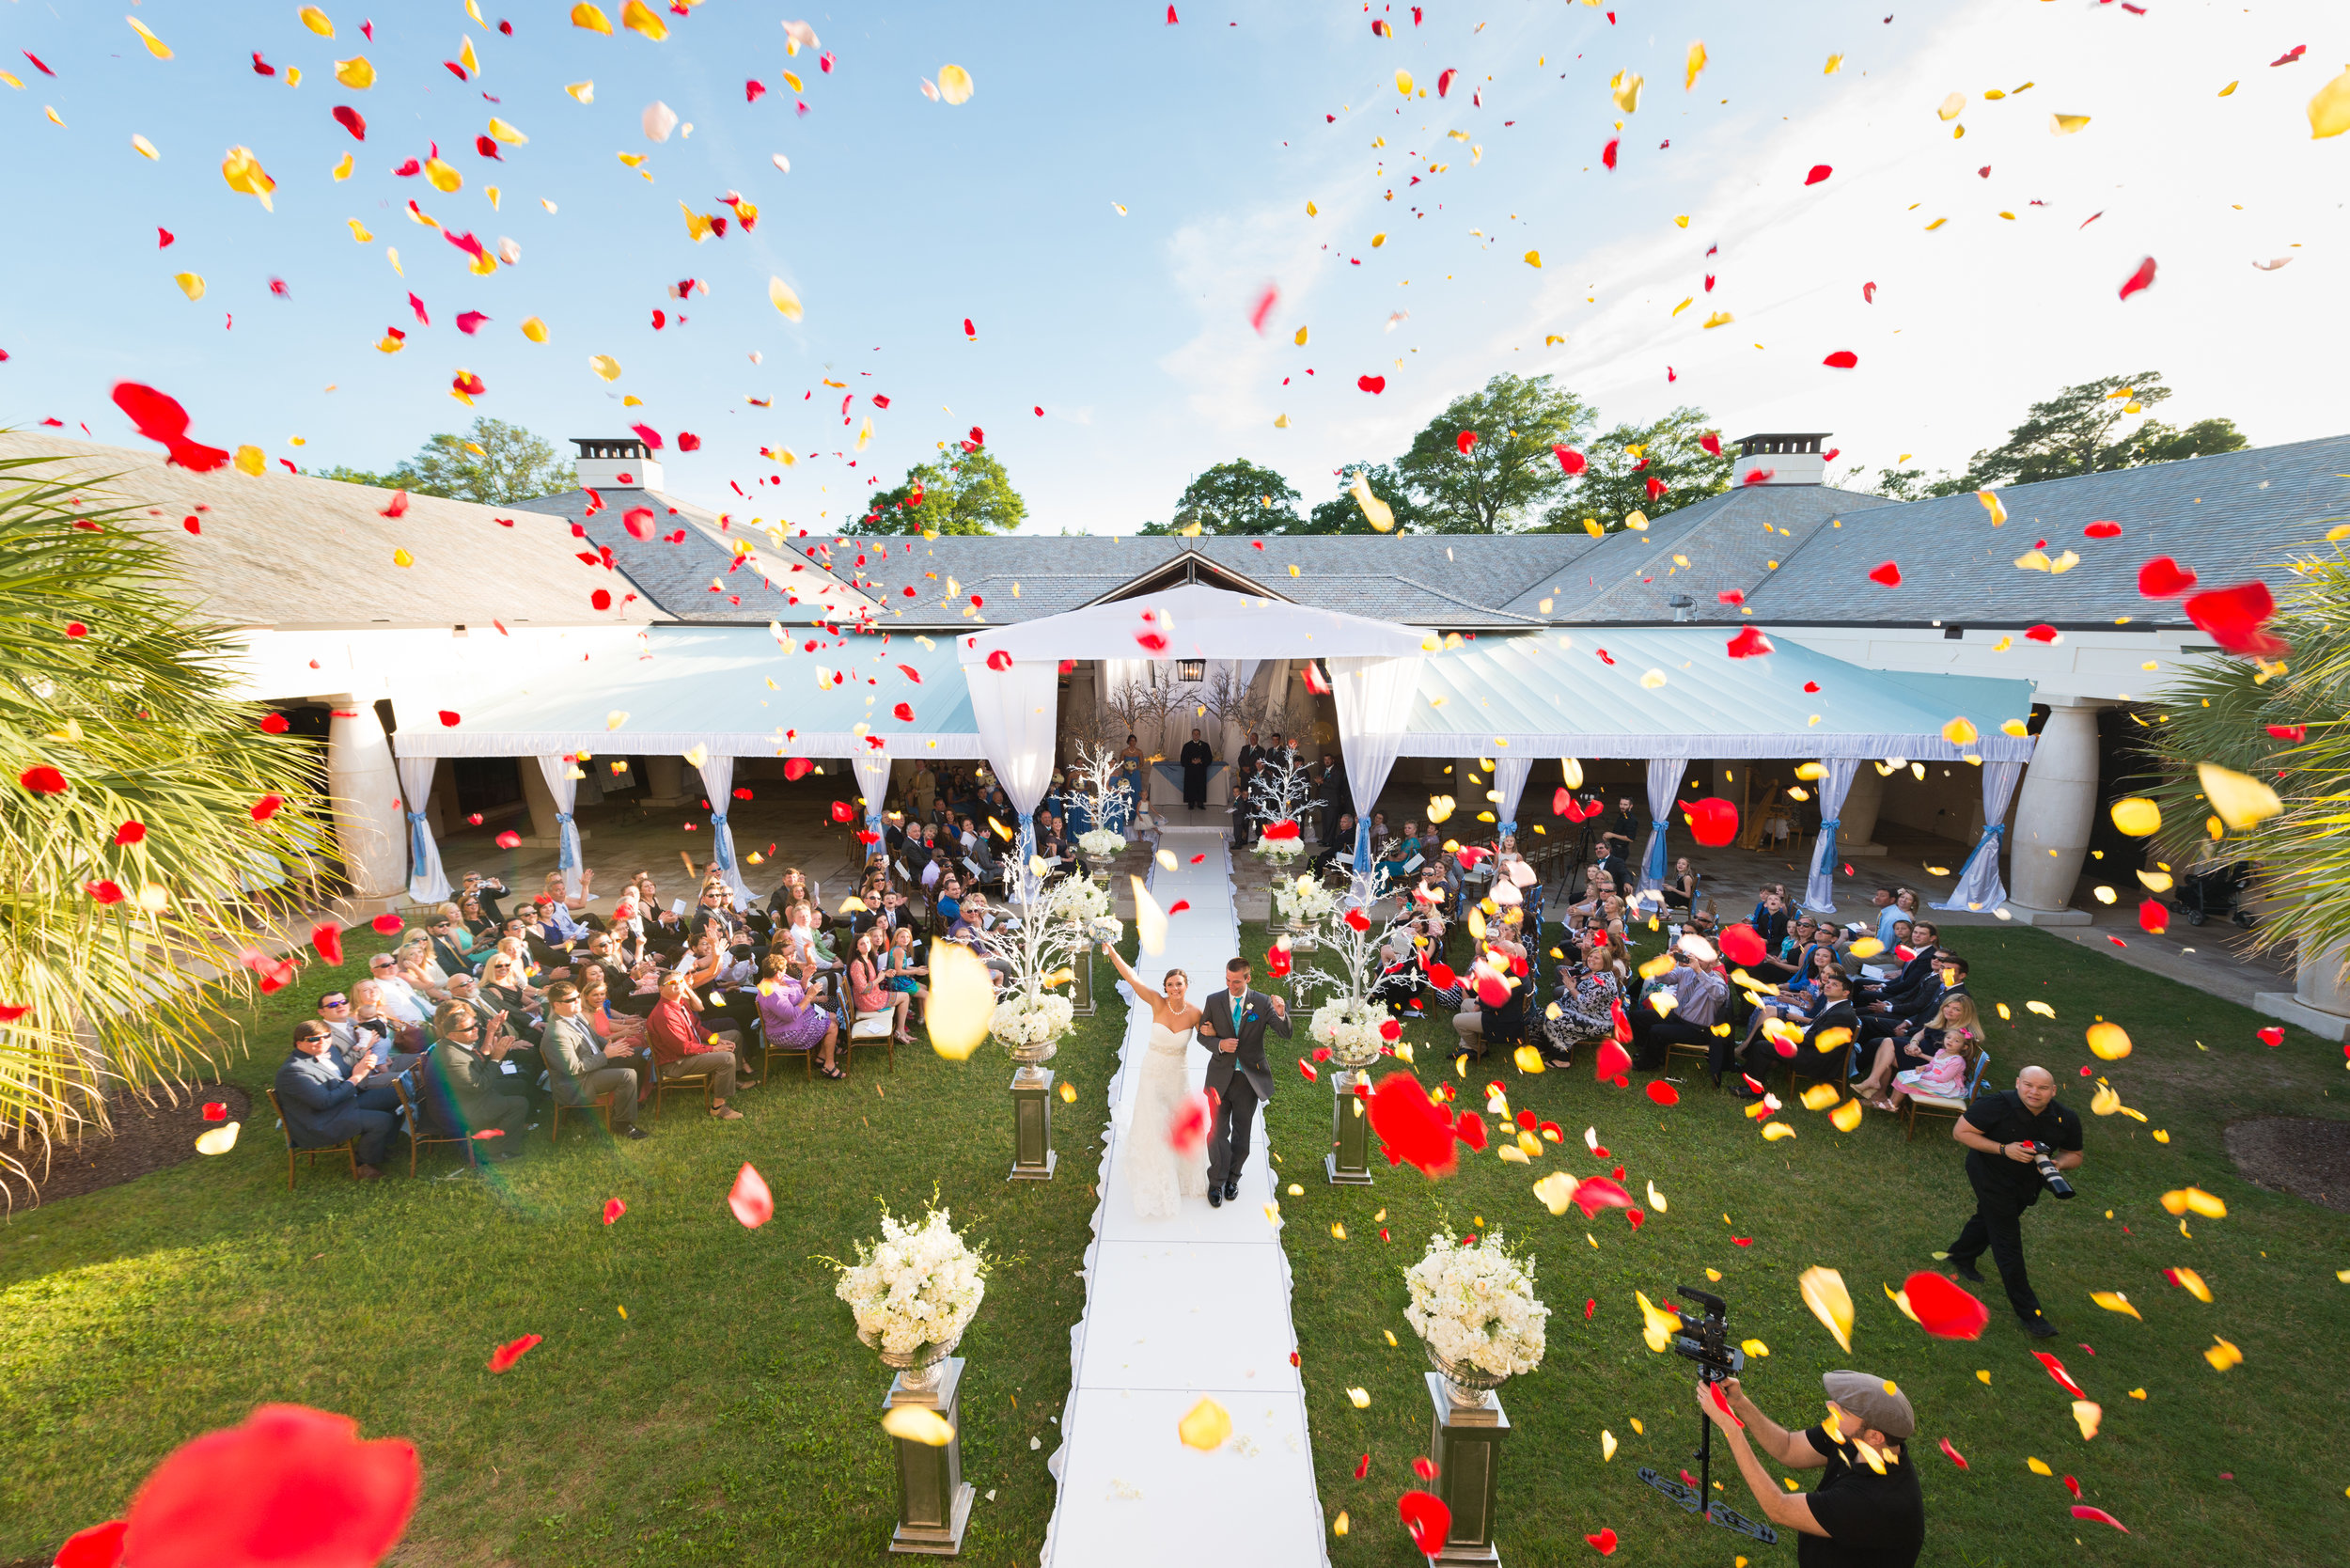 Carl-Kerridge-Photography-North-Beach-Wedding-May-2015-141.jpg